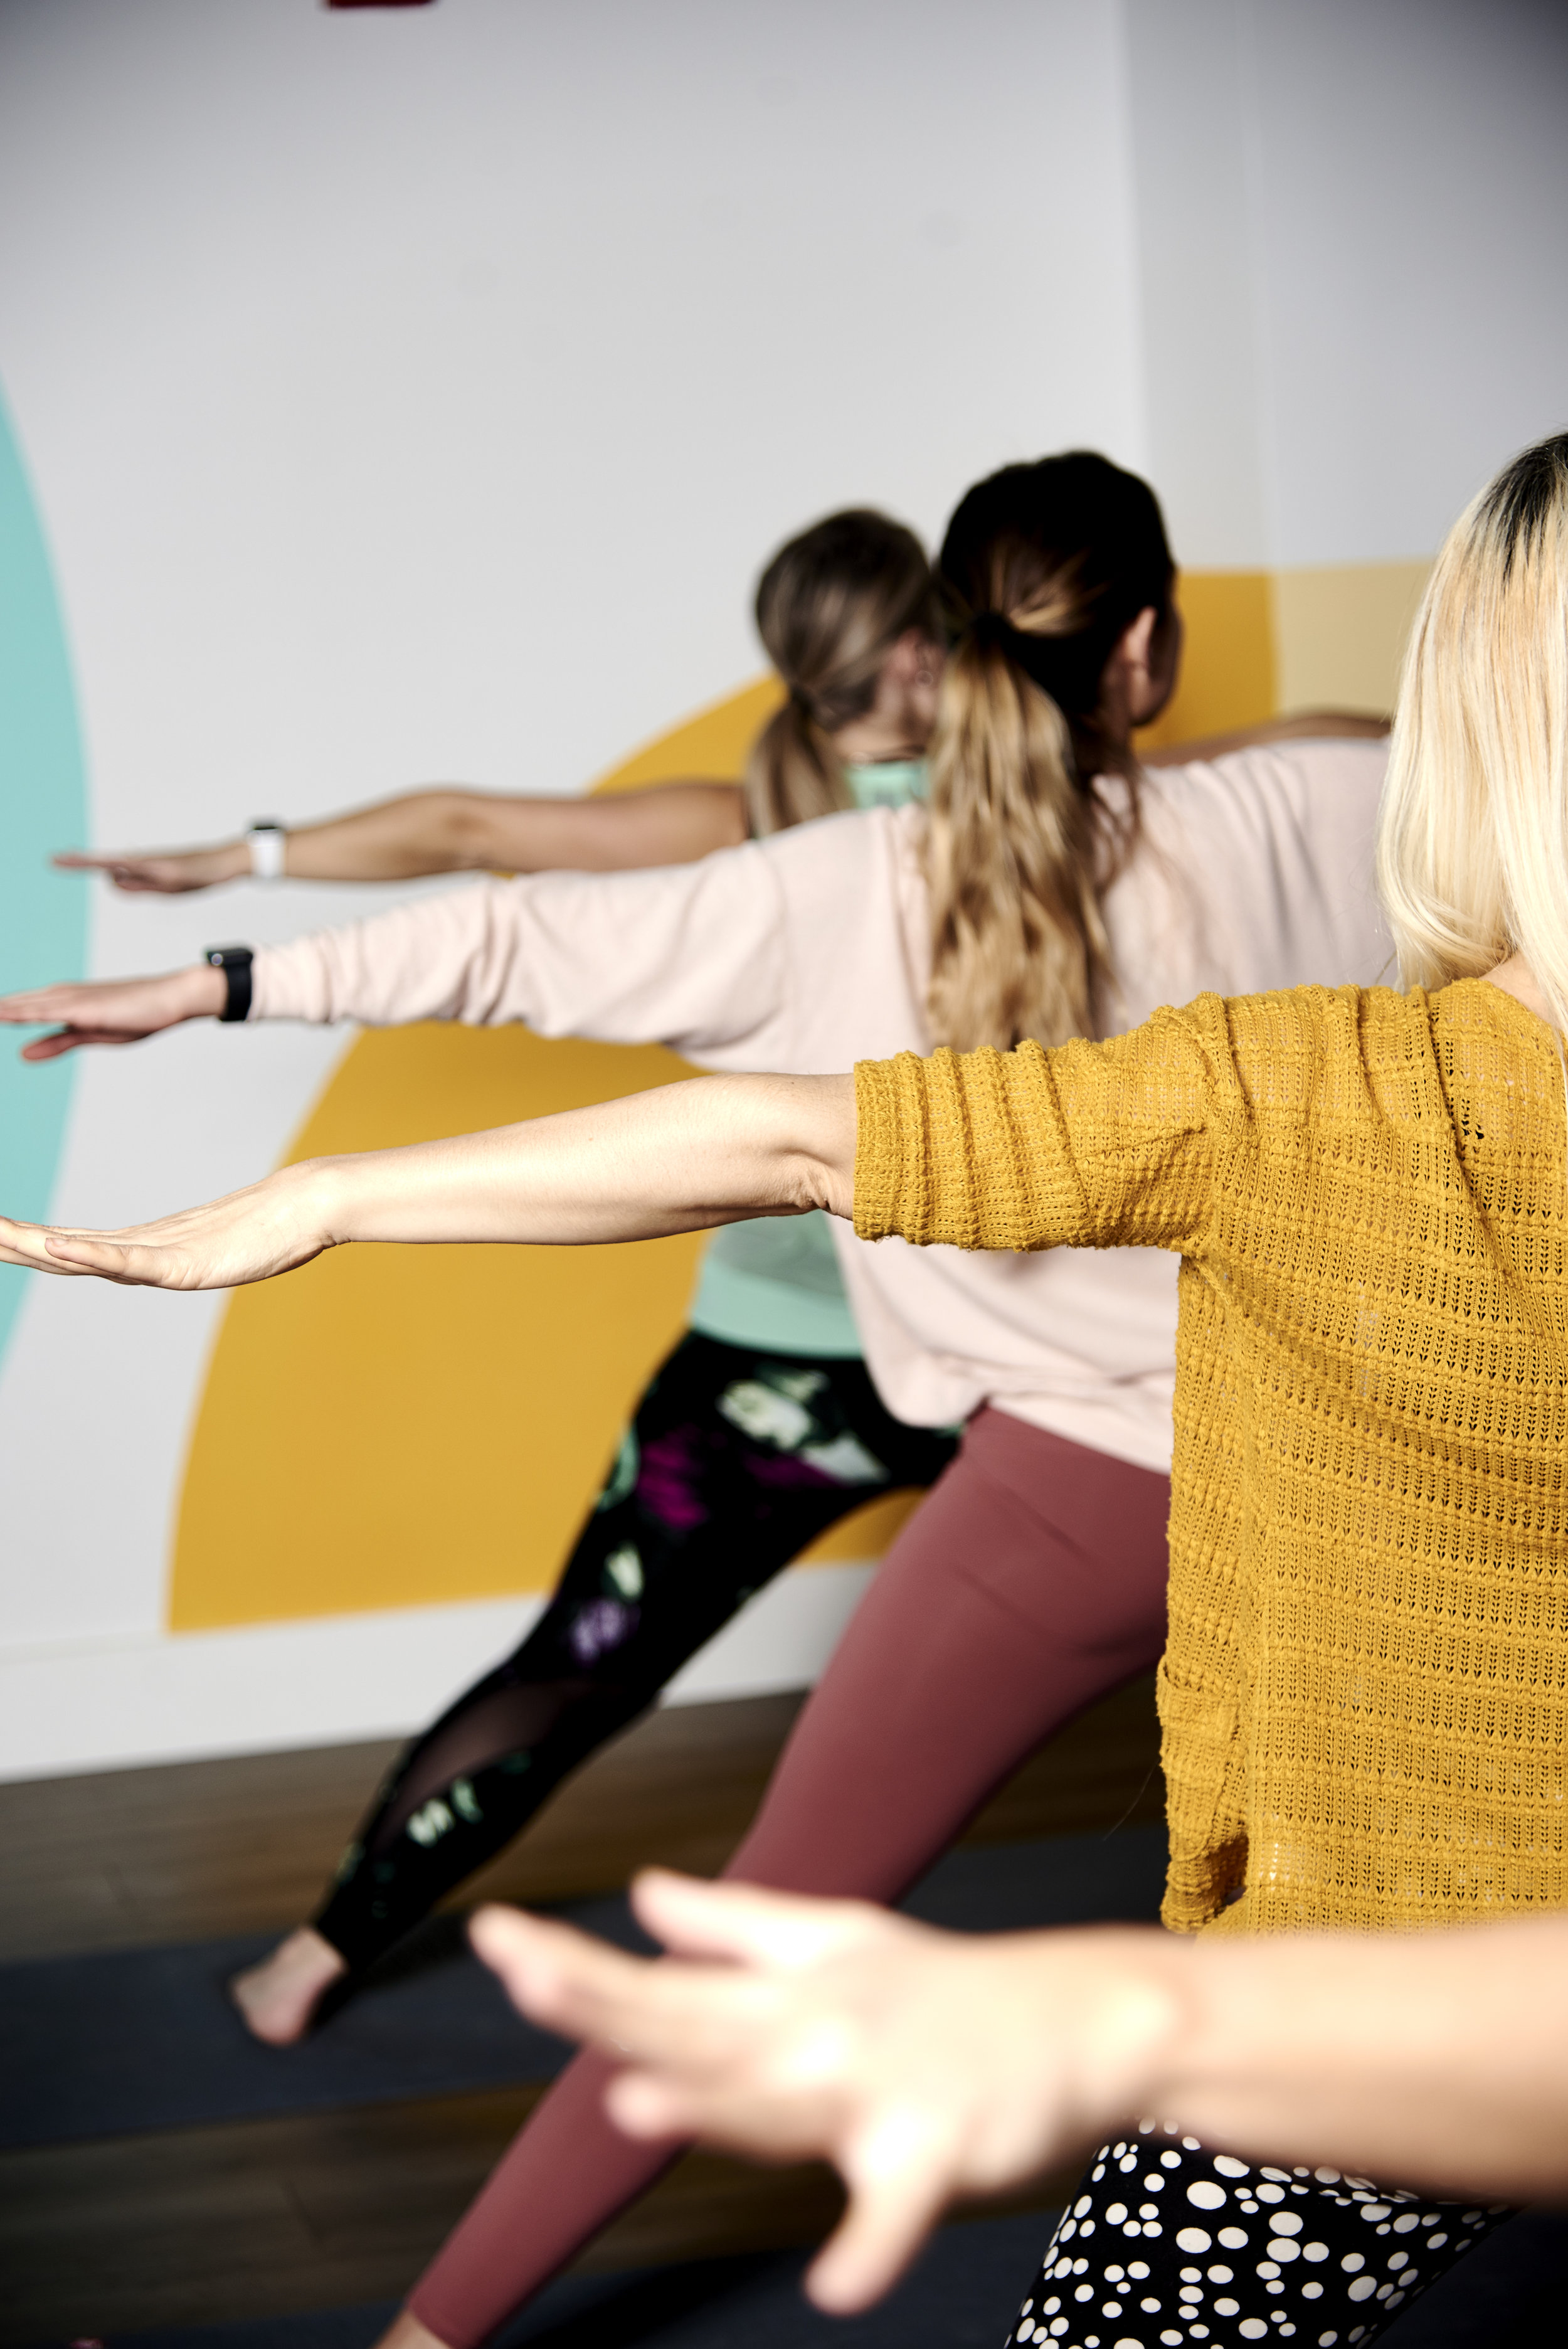 CLASS SYLLABUS - Asana & Sequencing Anatomy Sanskrit & Sutras Chakras AyurvedaMeditation Mantras, Myths and Mudras Yin Restorative Prenatal Essential Oils Business of Yoga